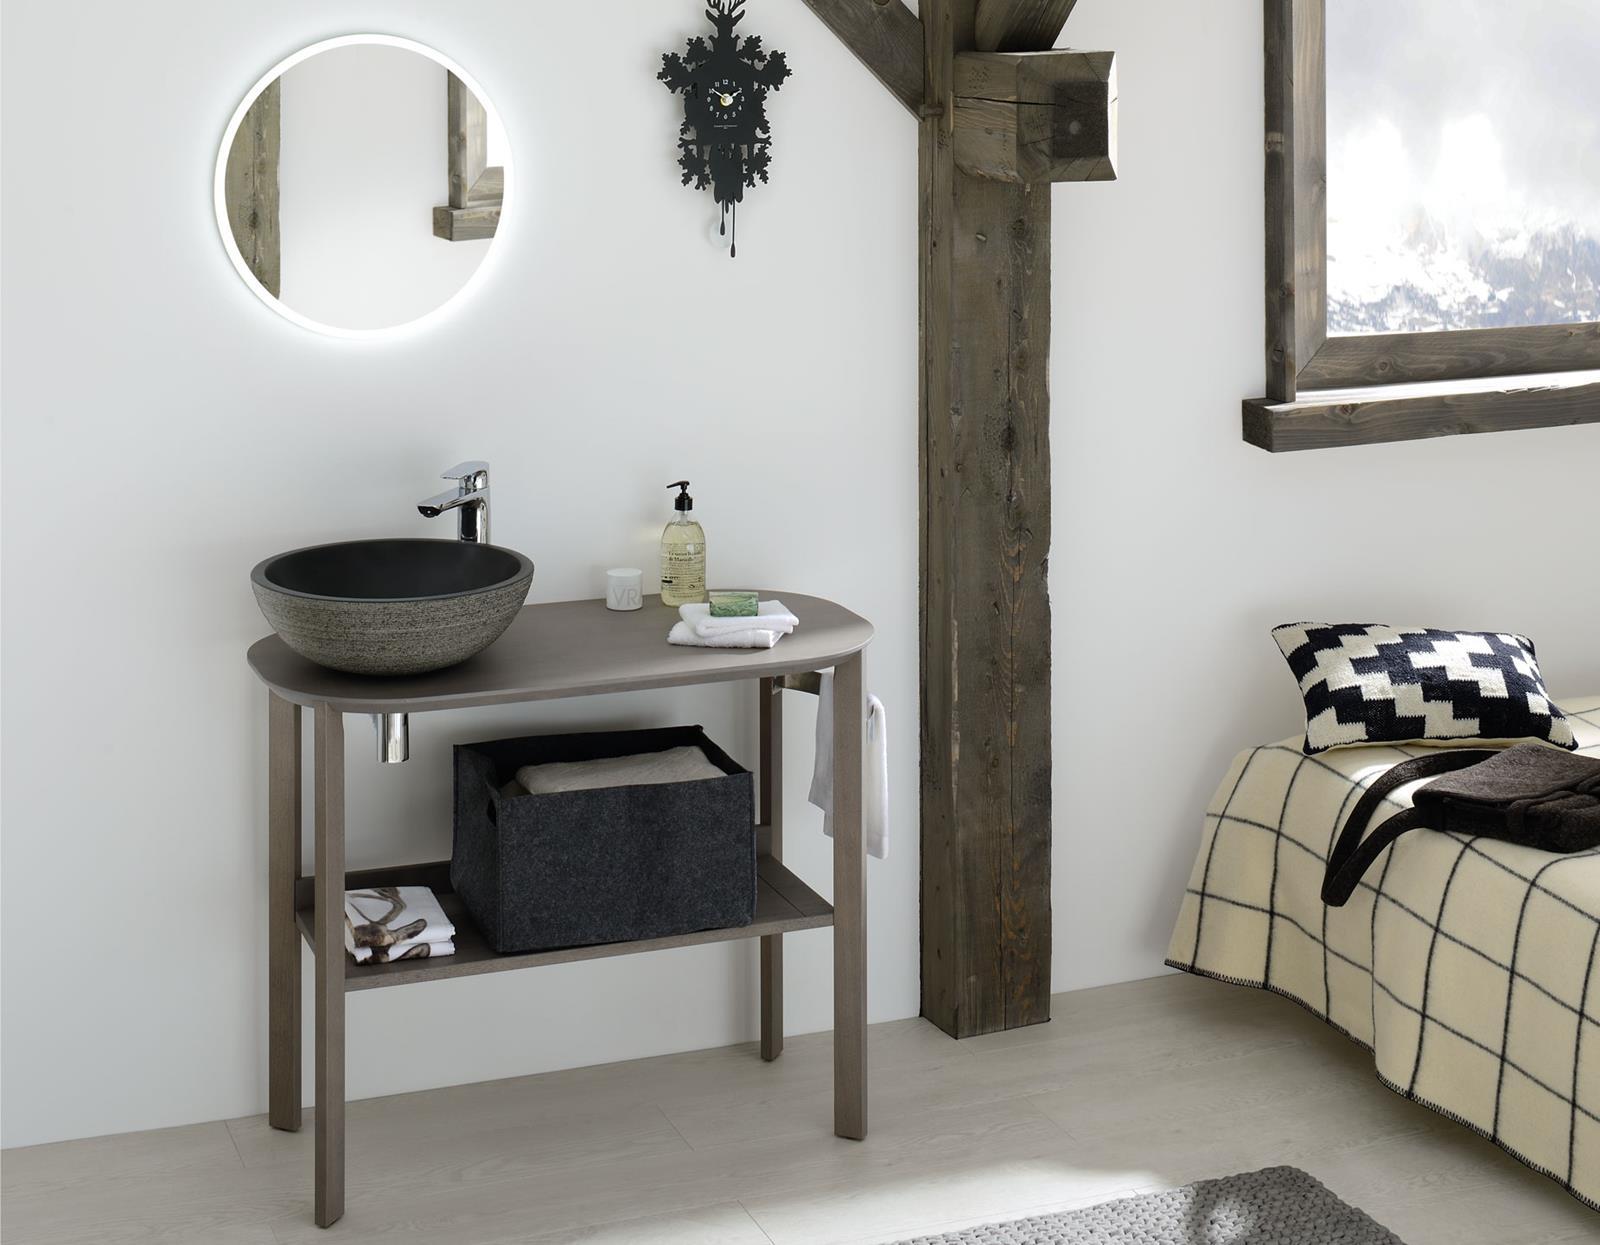 Meuble De Salle De Bain Eupen ~ meubles vente en gros services d installation pose professionnelle